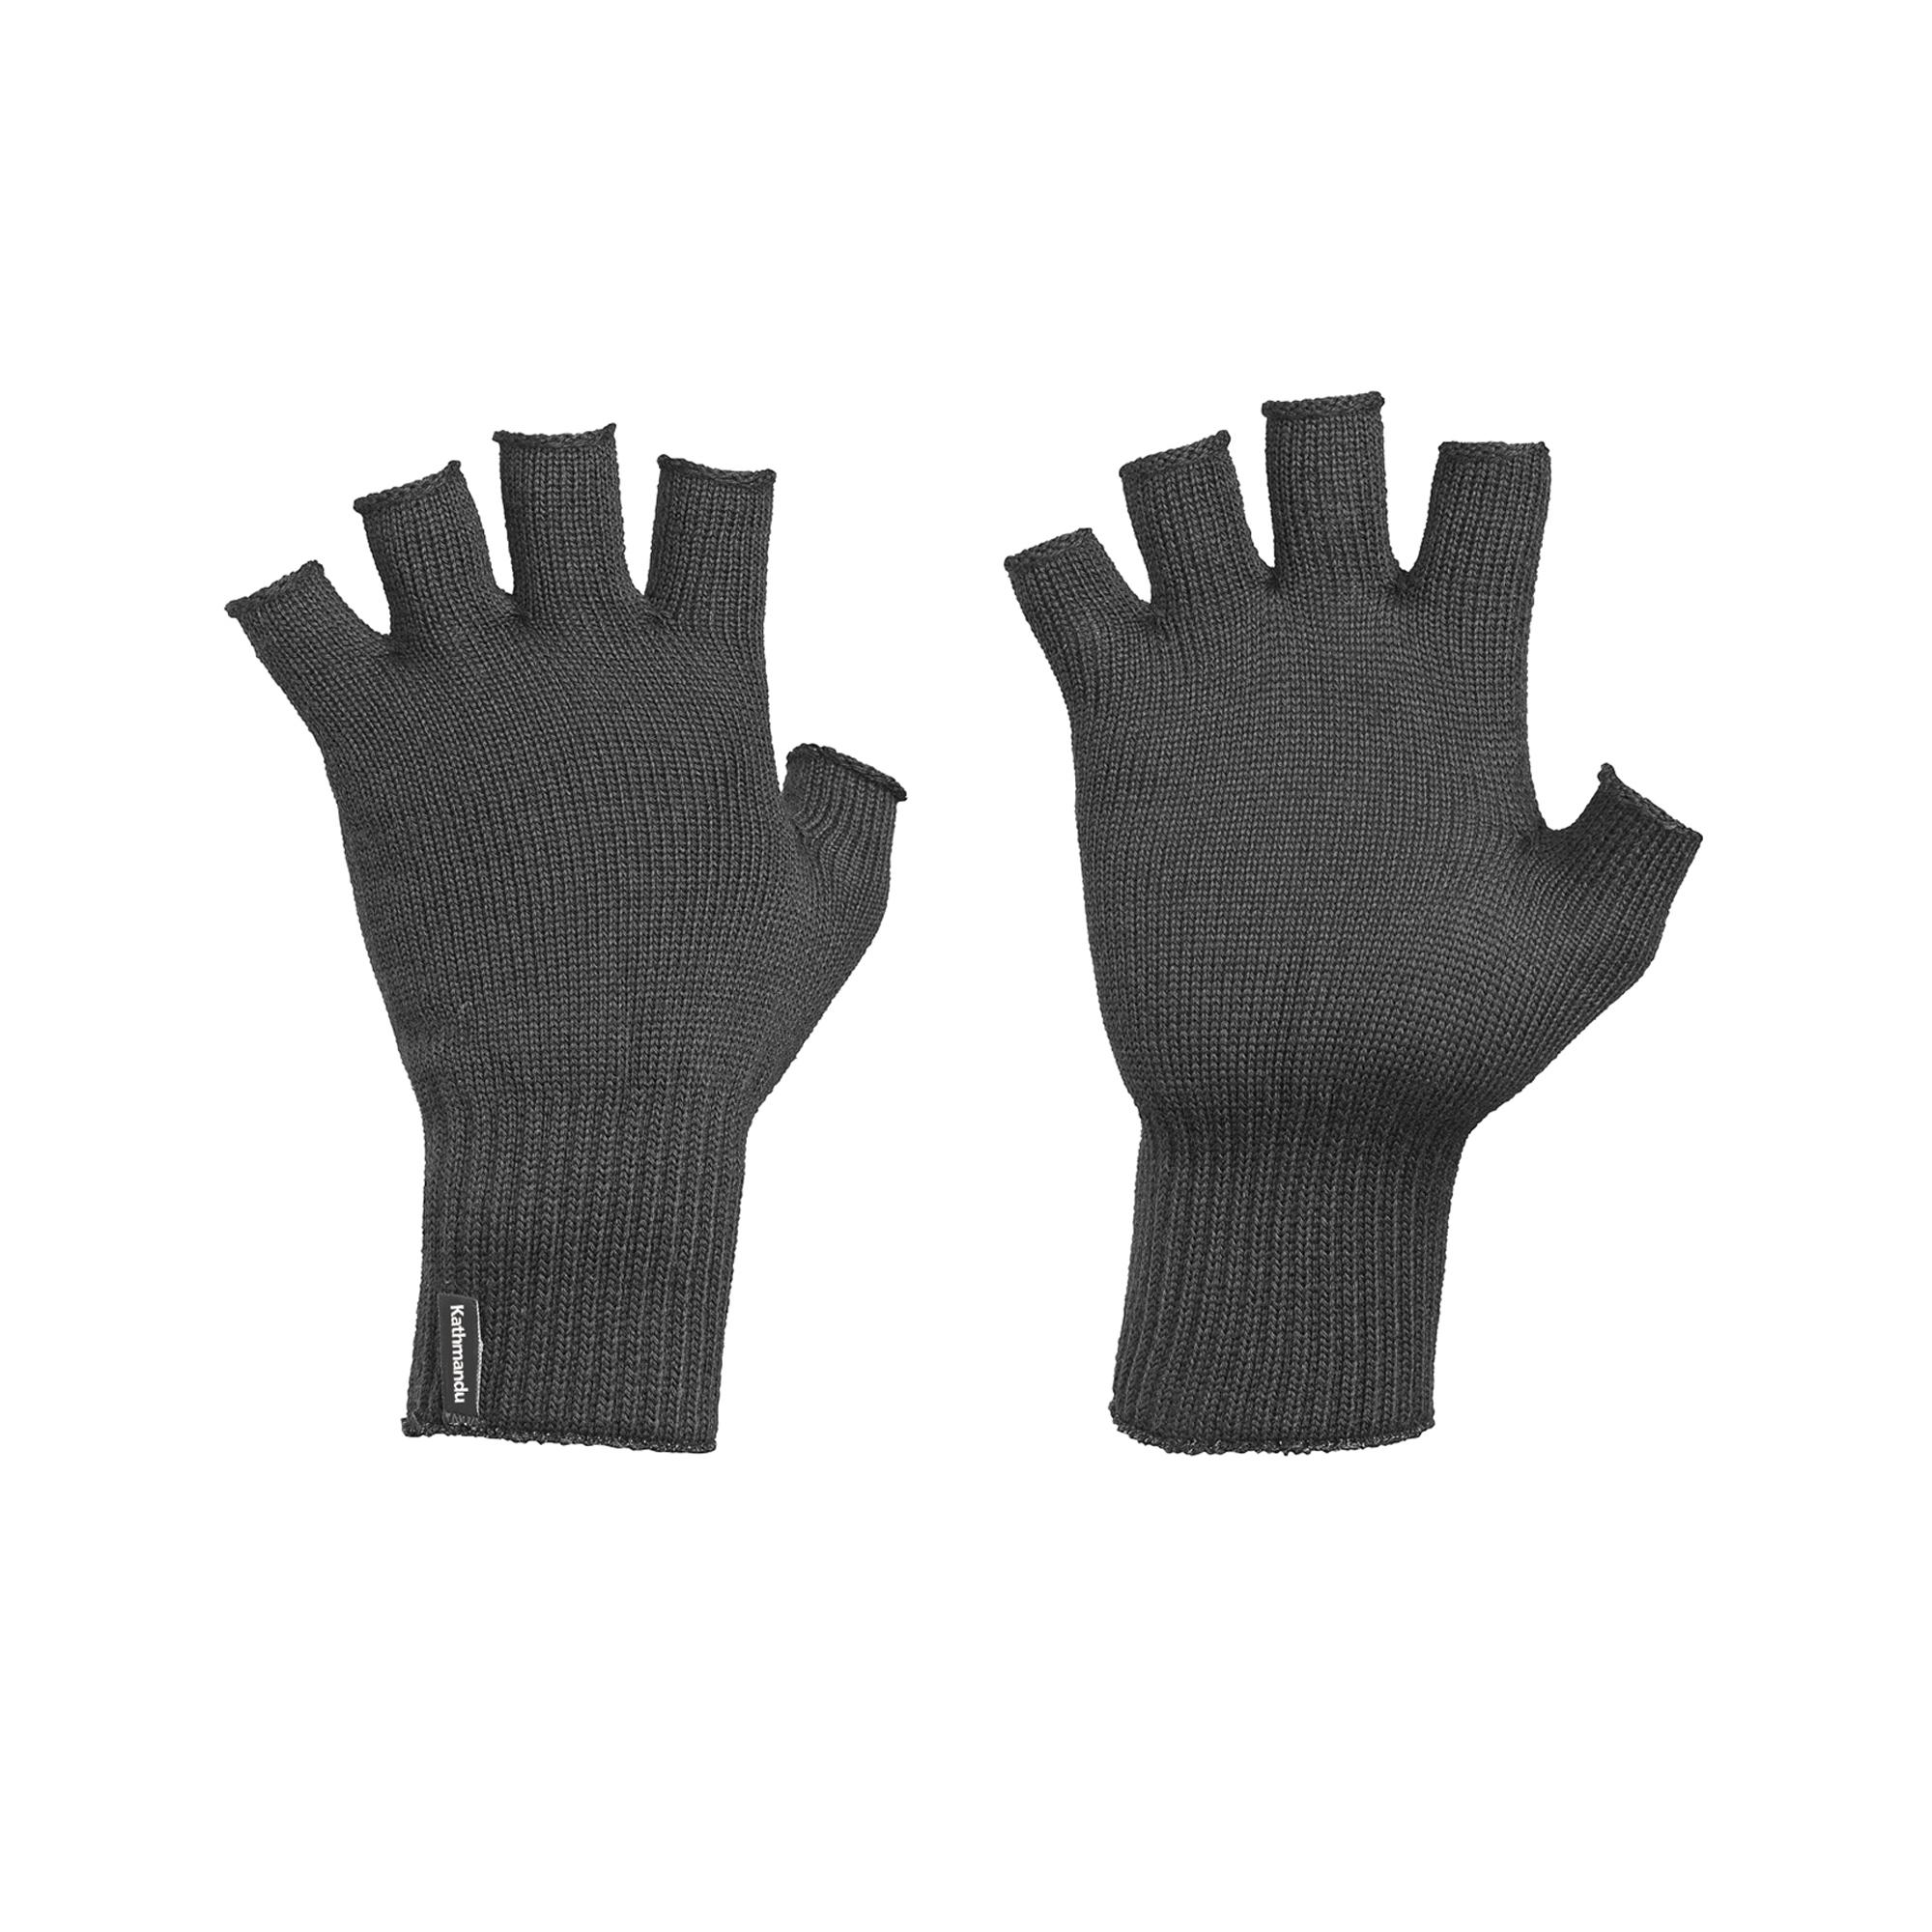 Kathmandu Polypro Thermal Knitted Warm Winter Fingerless Gloves   eBay